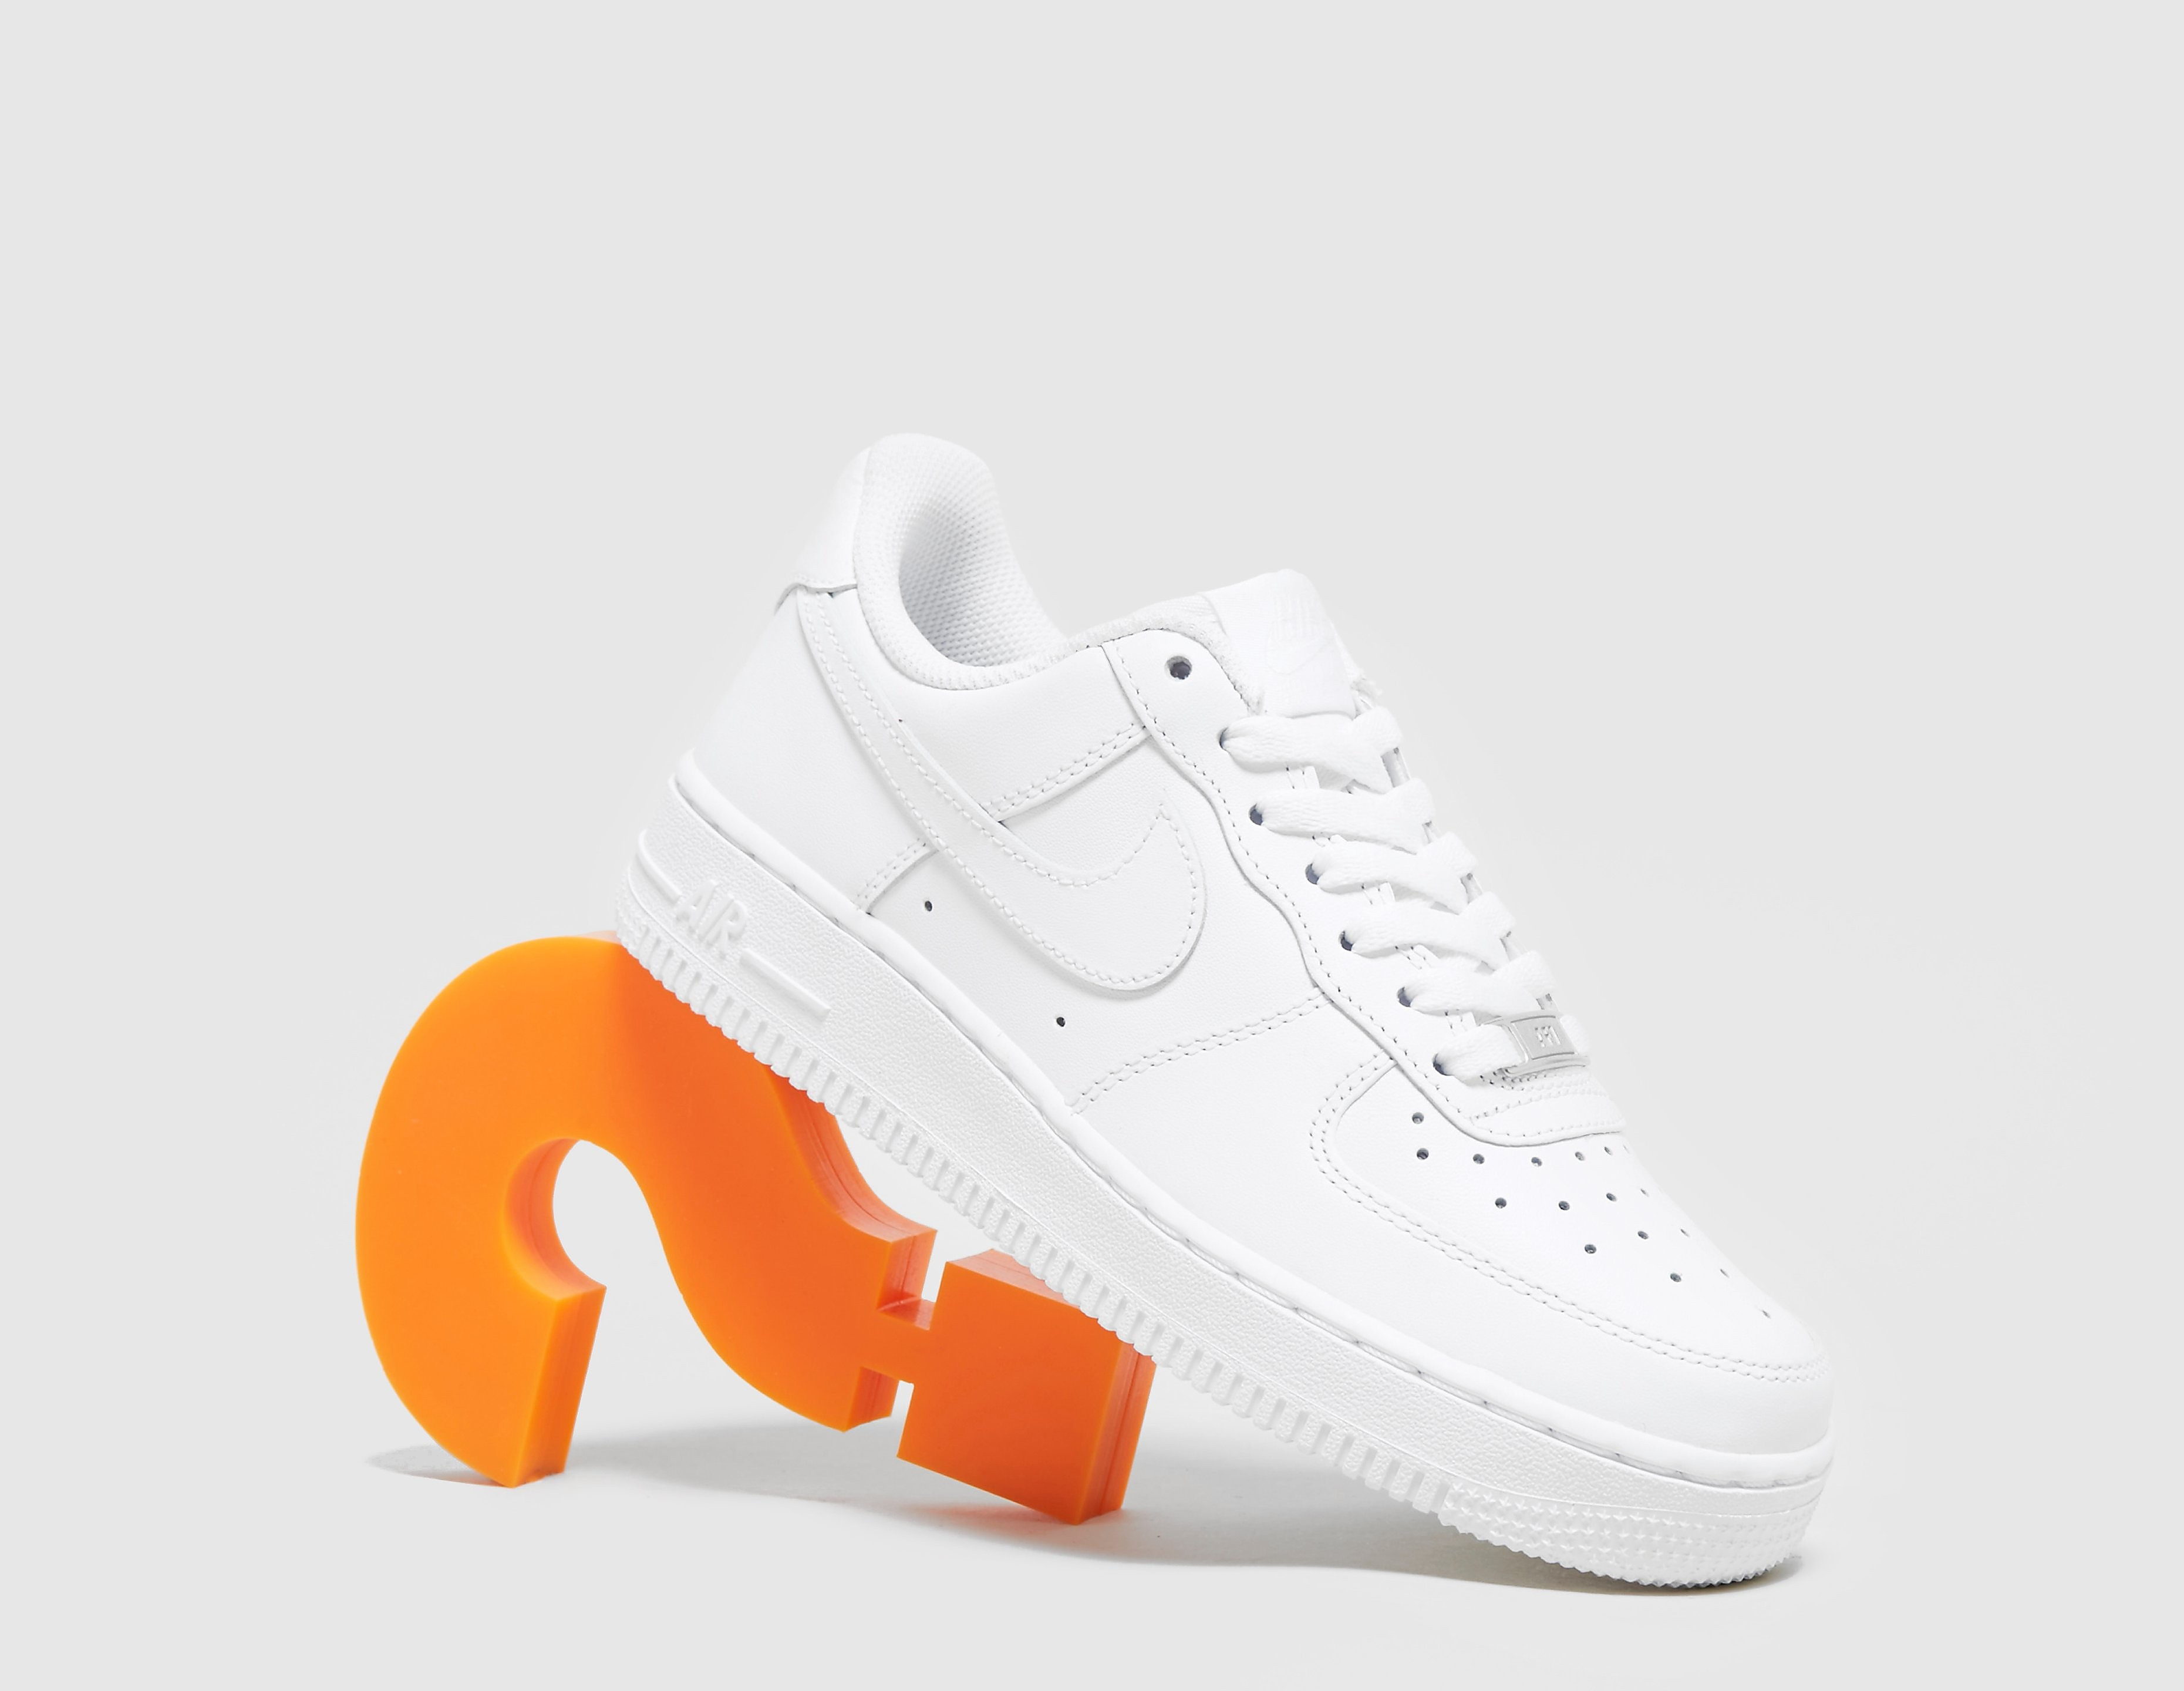 Nike Air Force 1 Low Women's, blanco